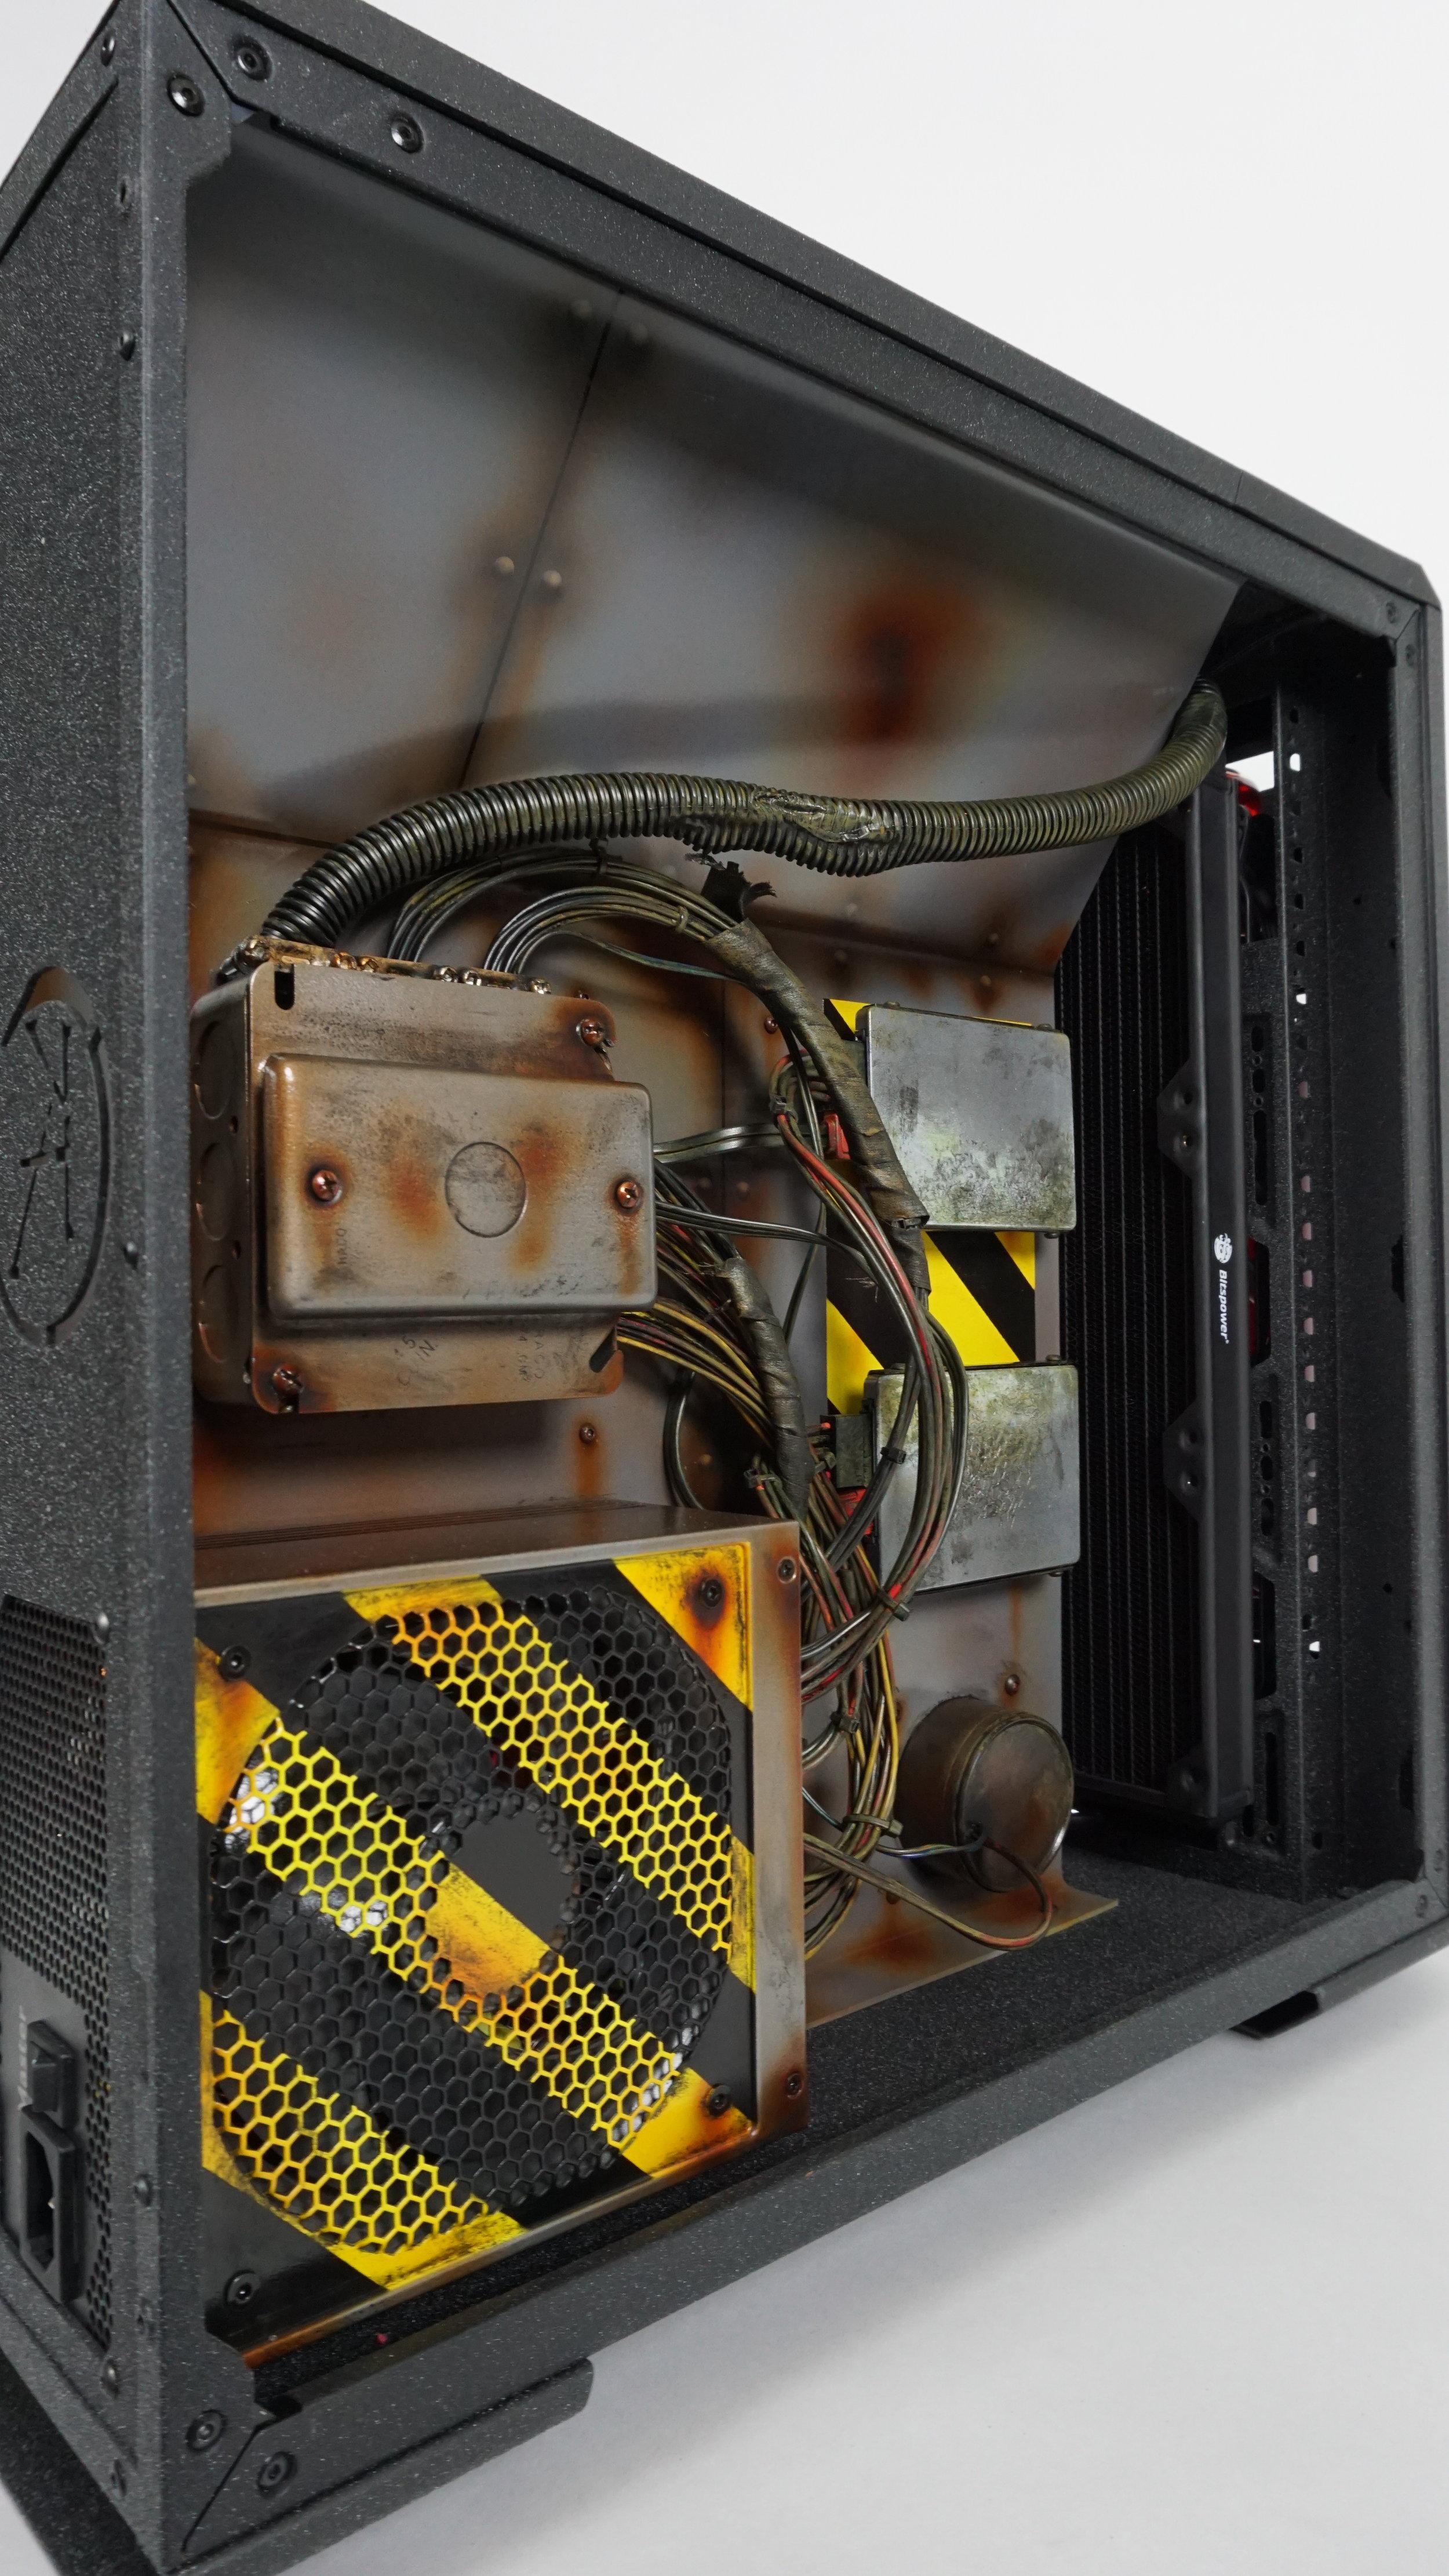 DSC00556.JPG